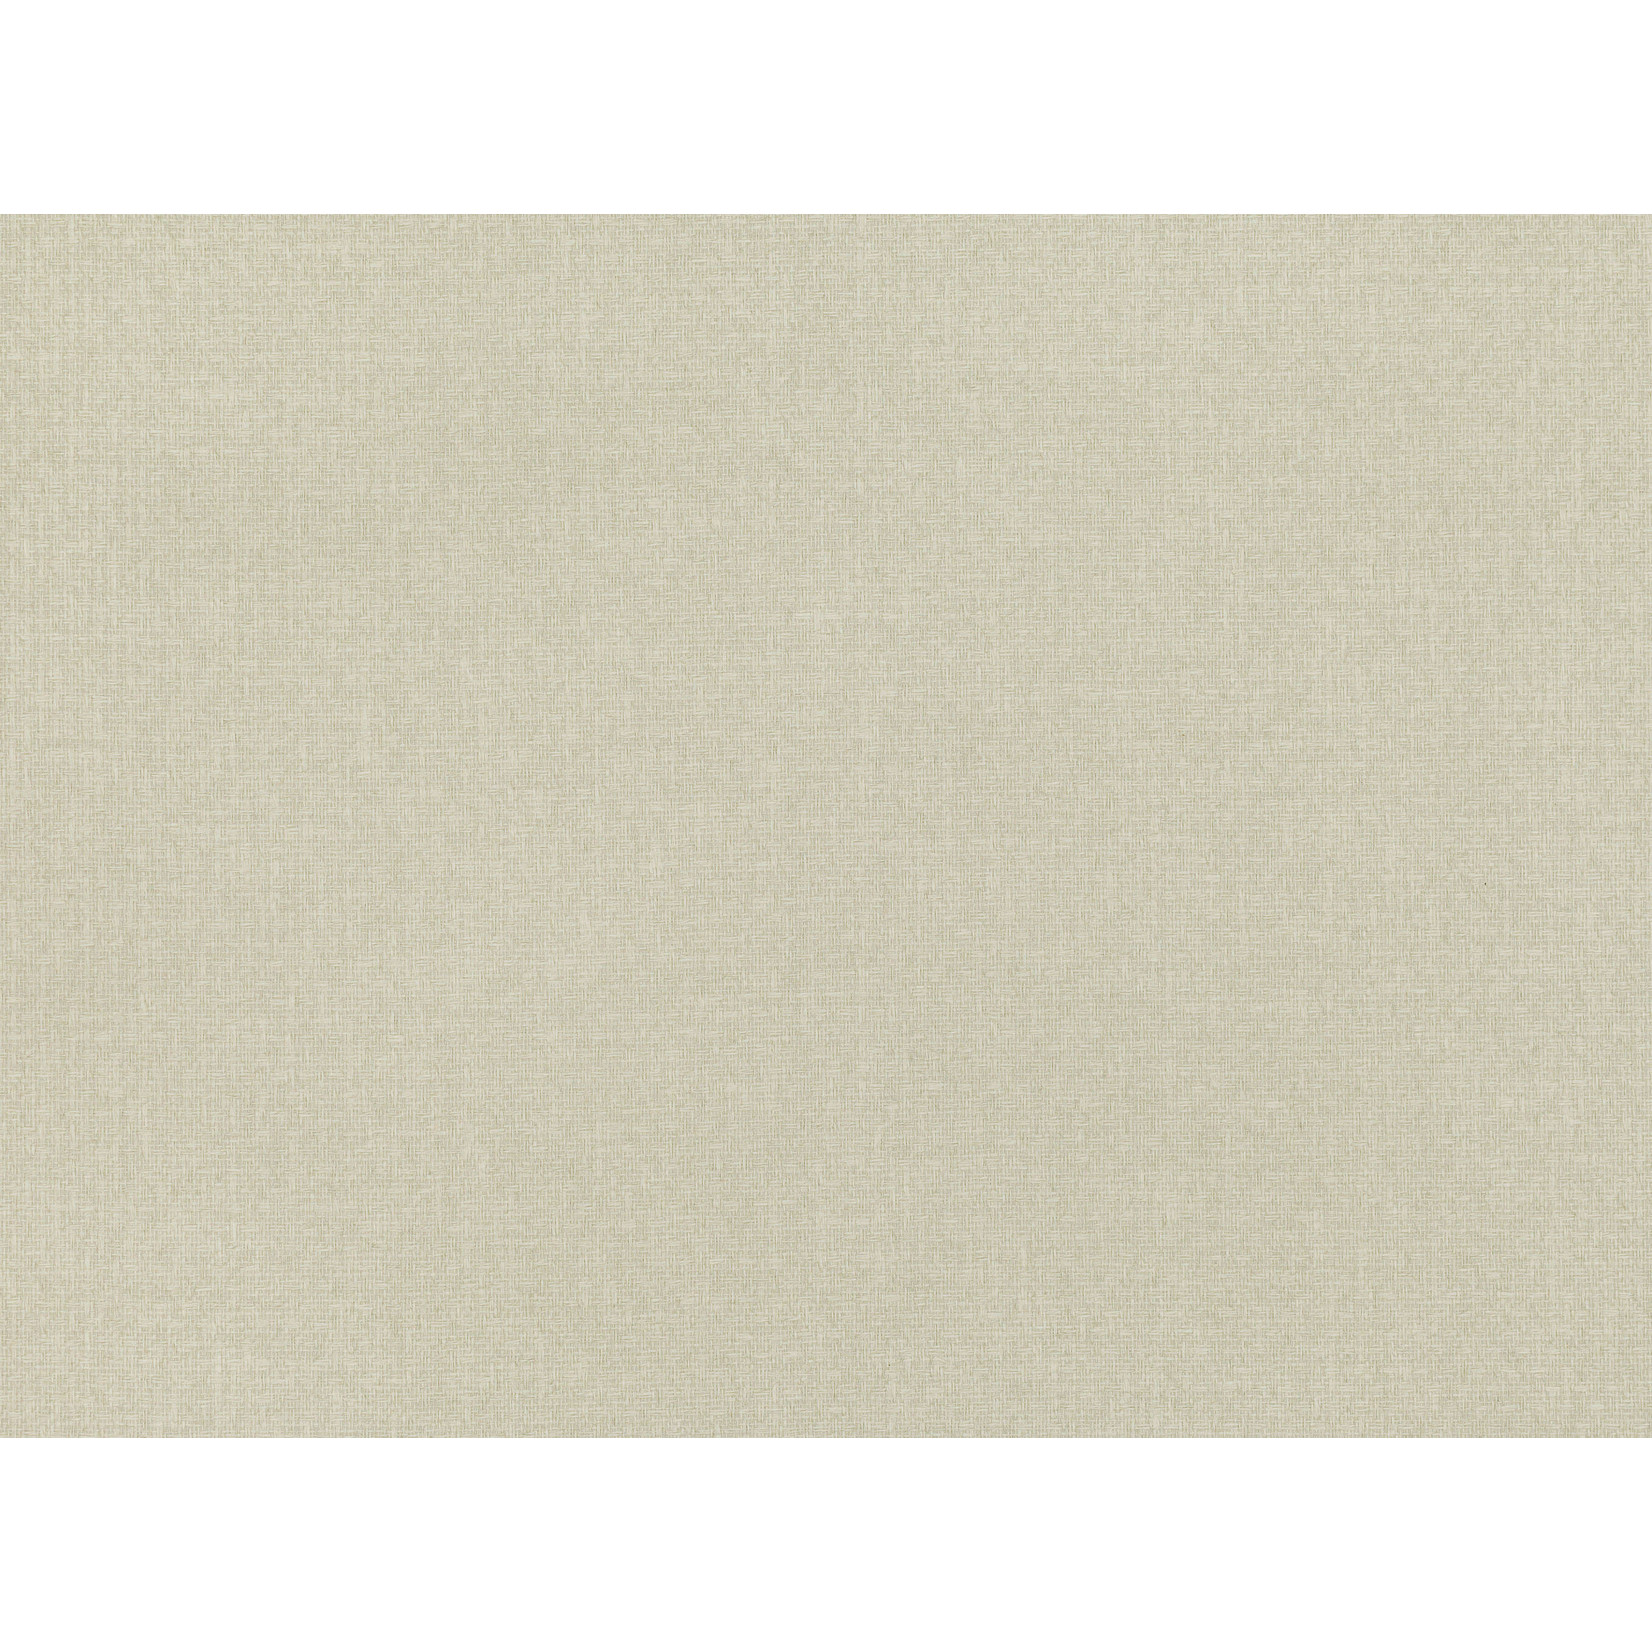 Mark Alexander Paperweave Handwoven Wallcoverings | Shifu Latte